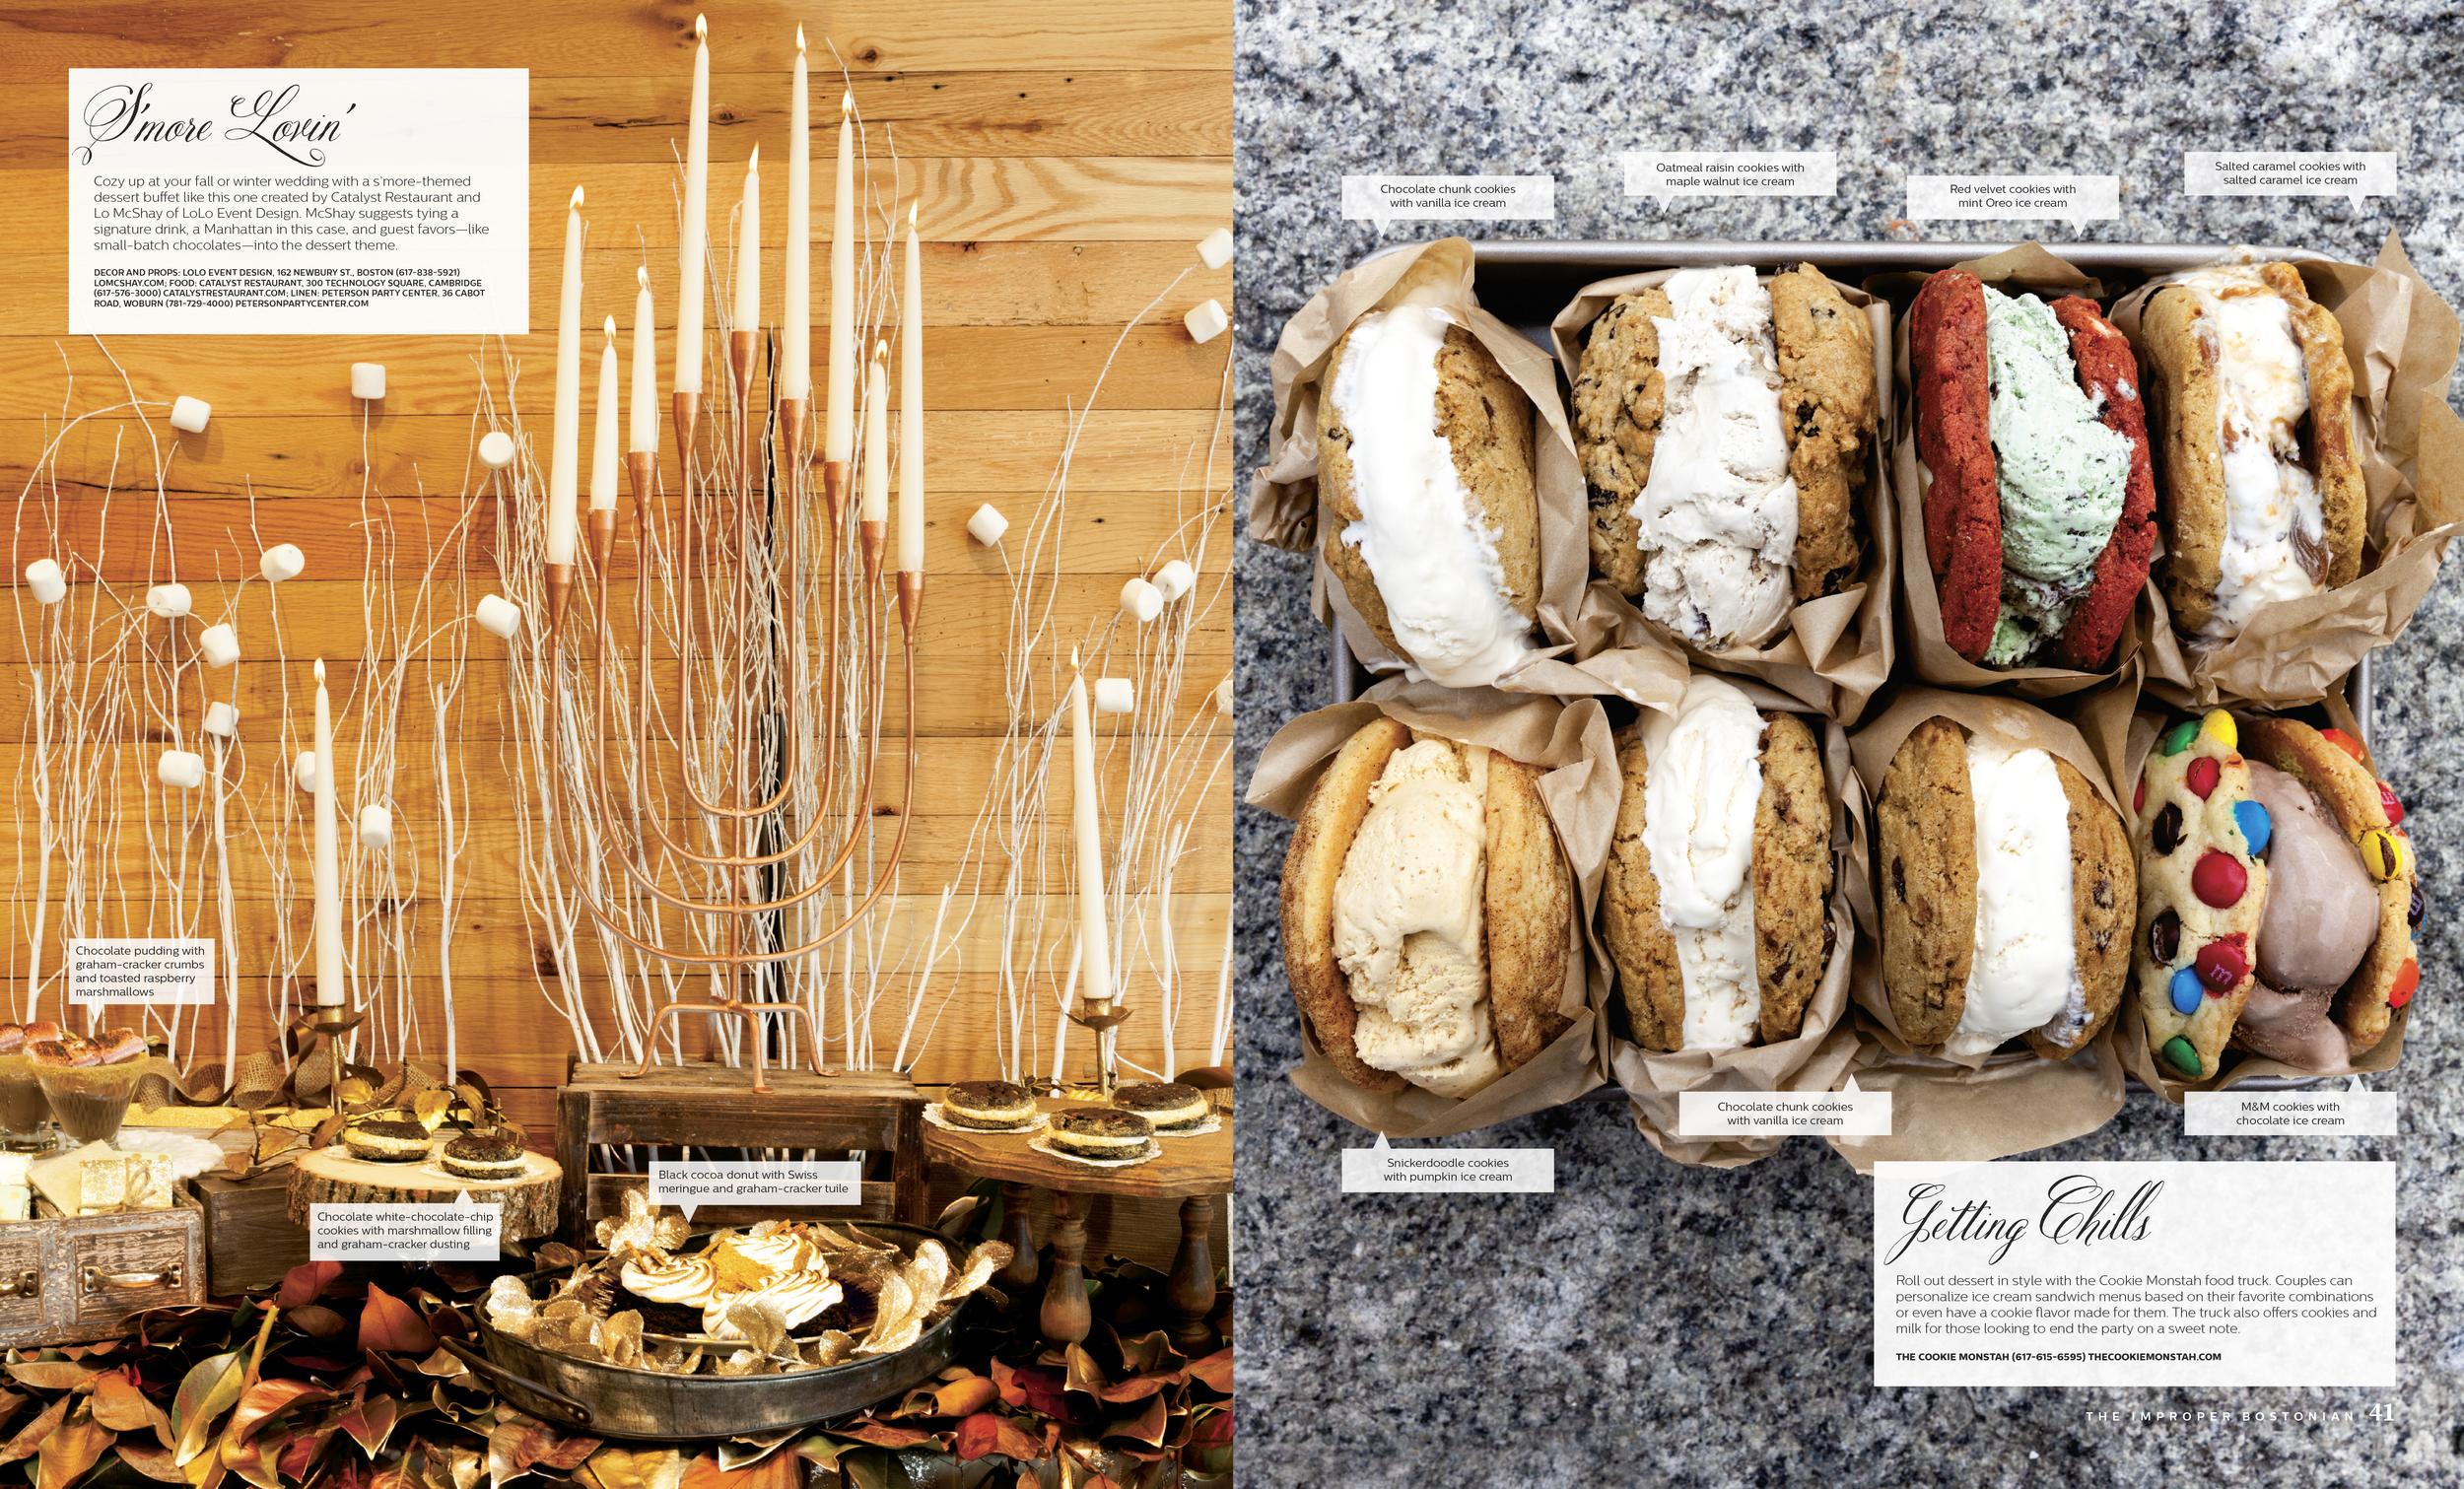 041ImpB_Oct28-Desserts-2.jpg